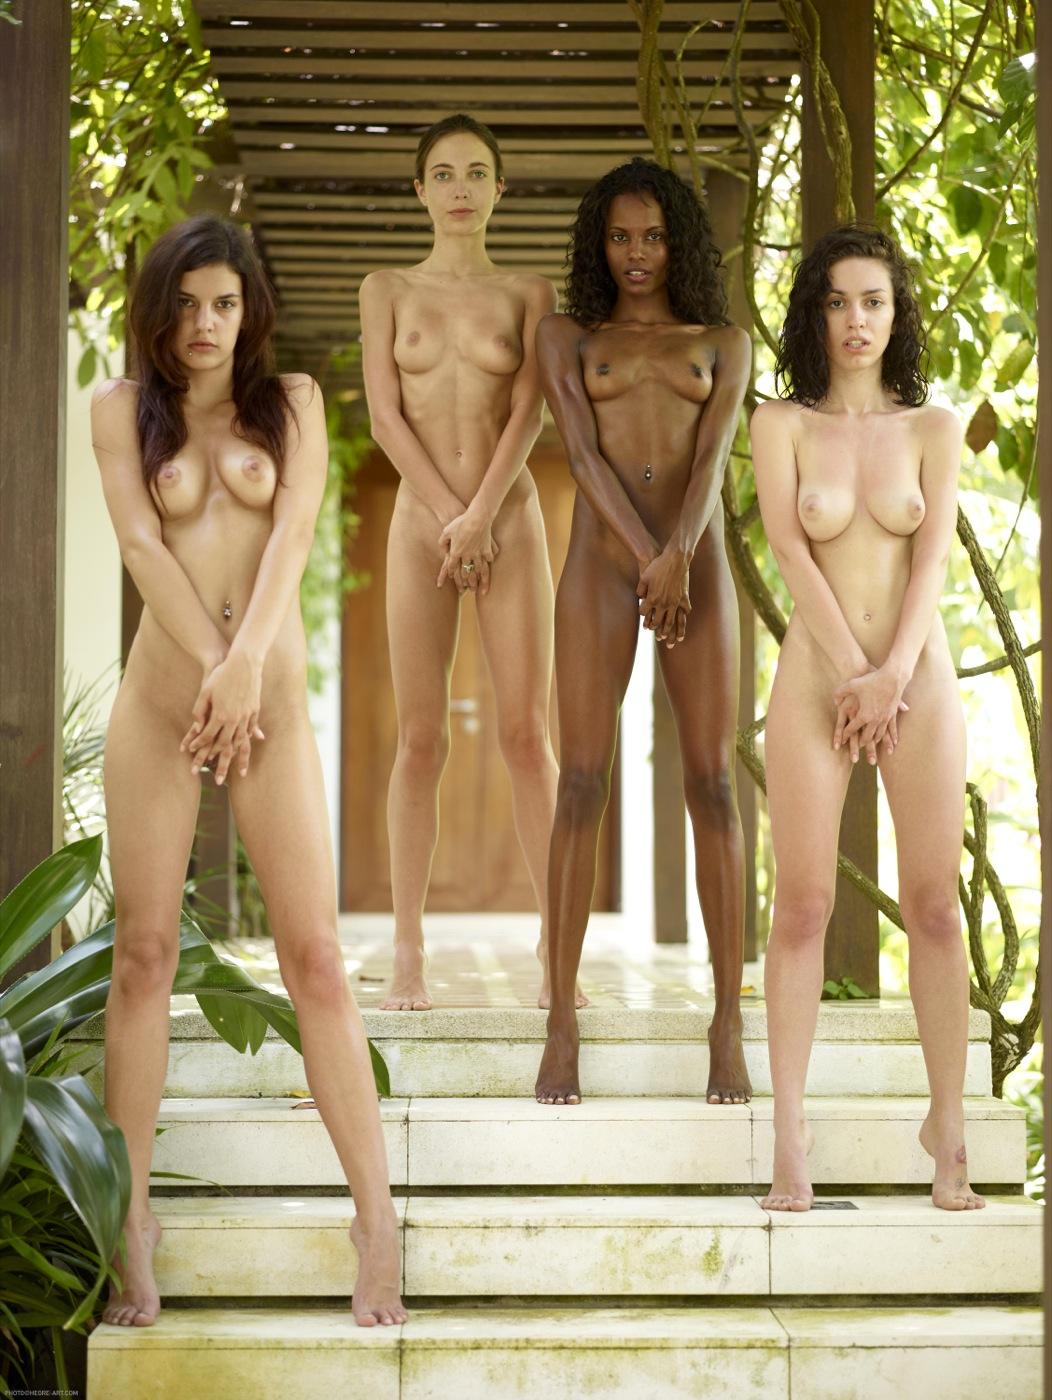 Mujeres Desnudas En Grupo